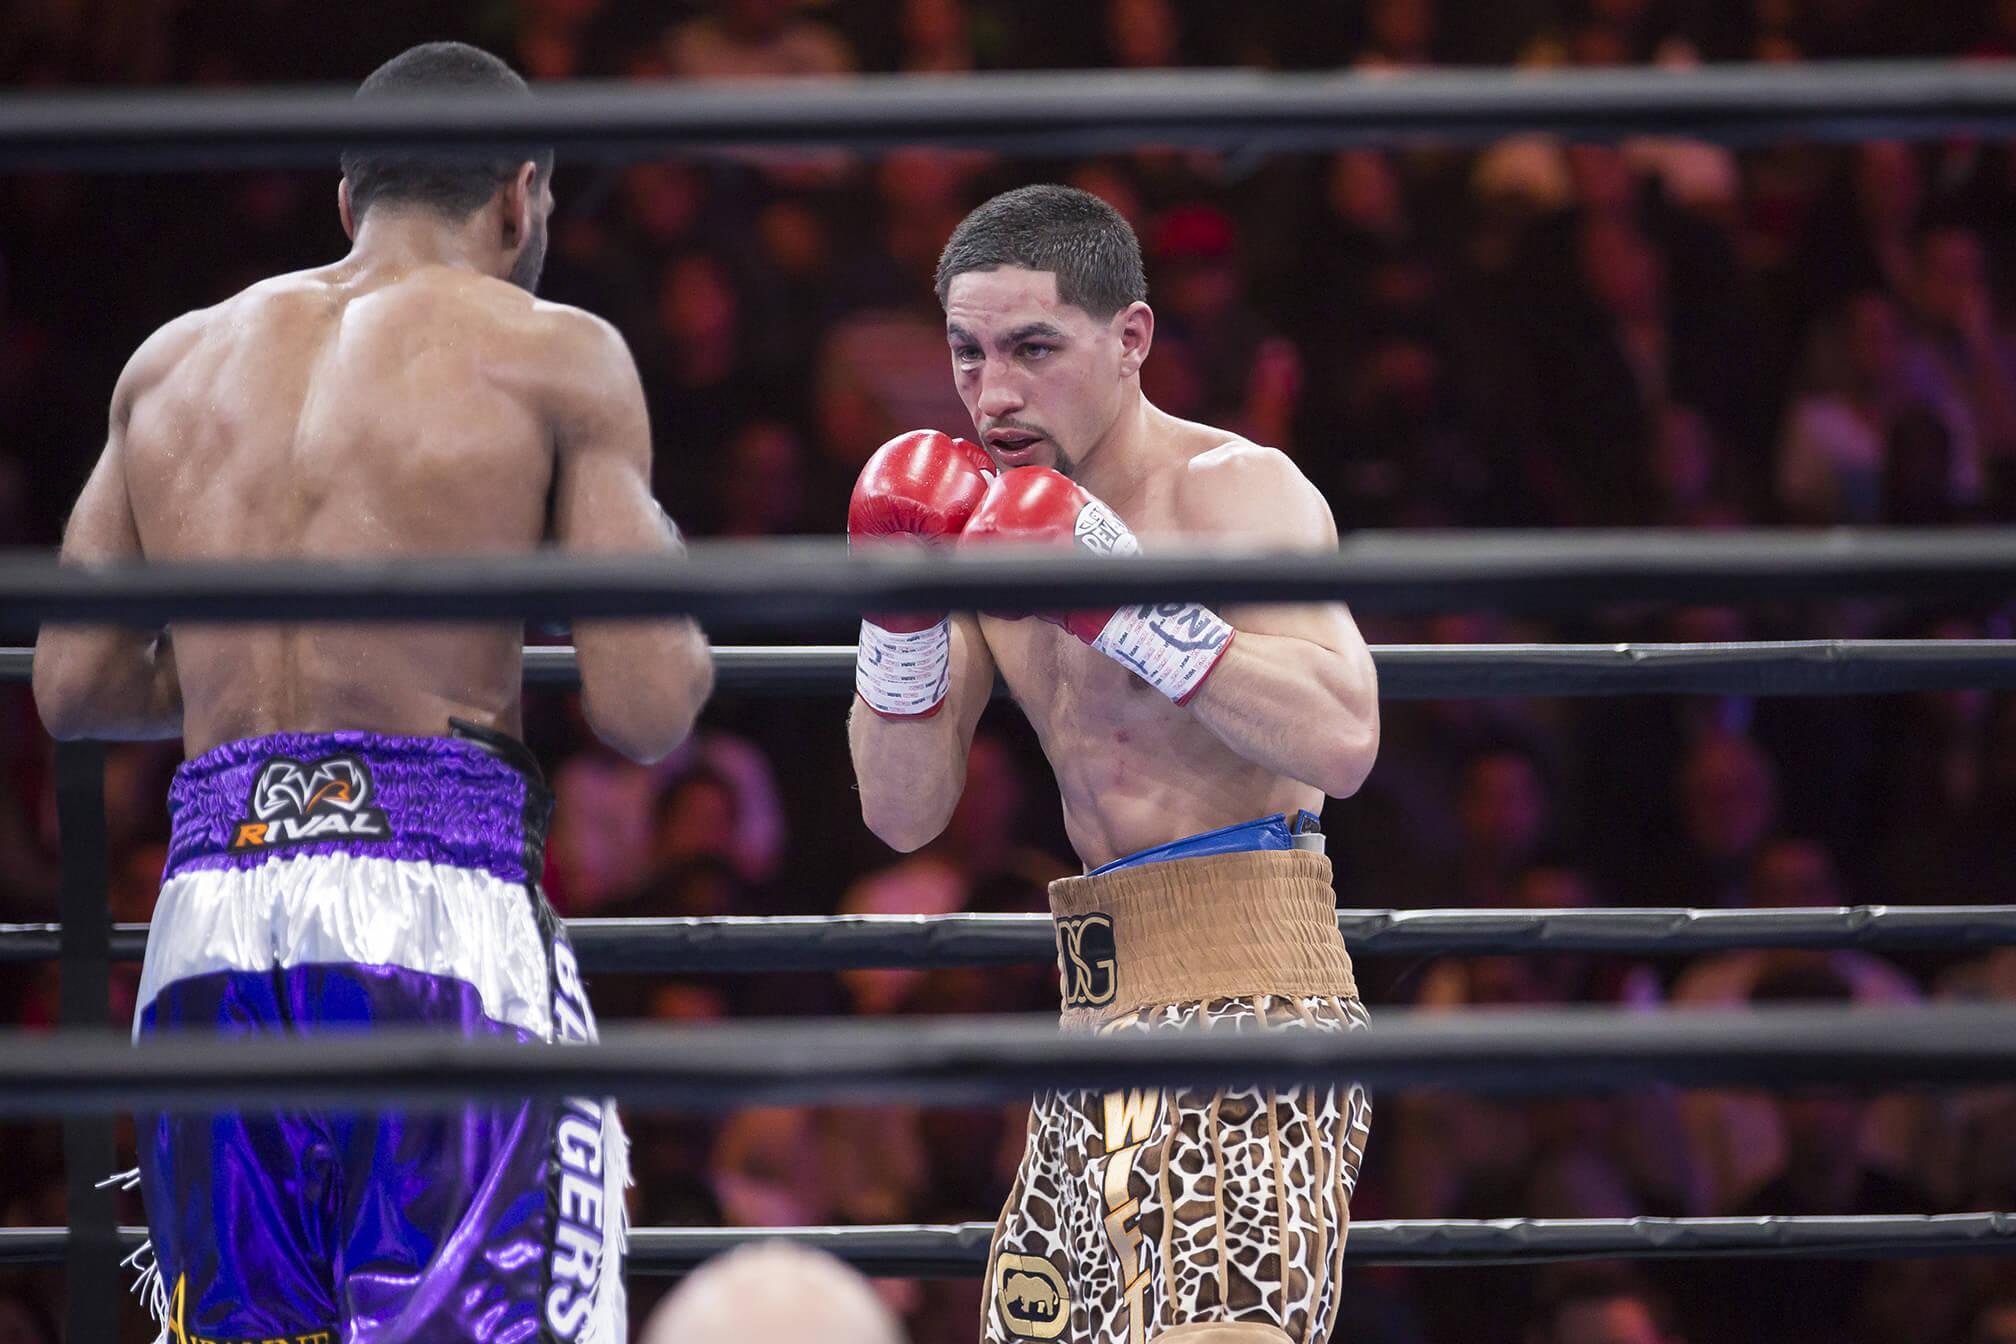 Boxing_041115_063W.jpg